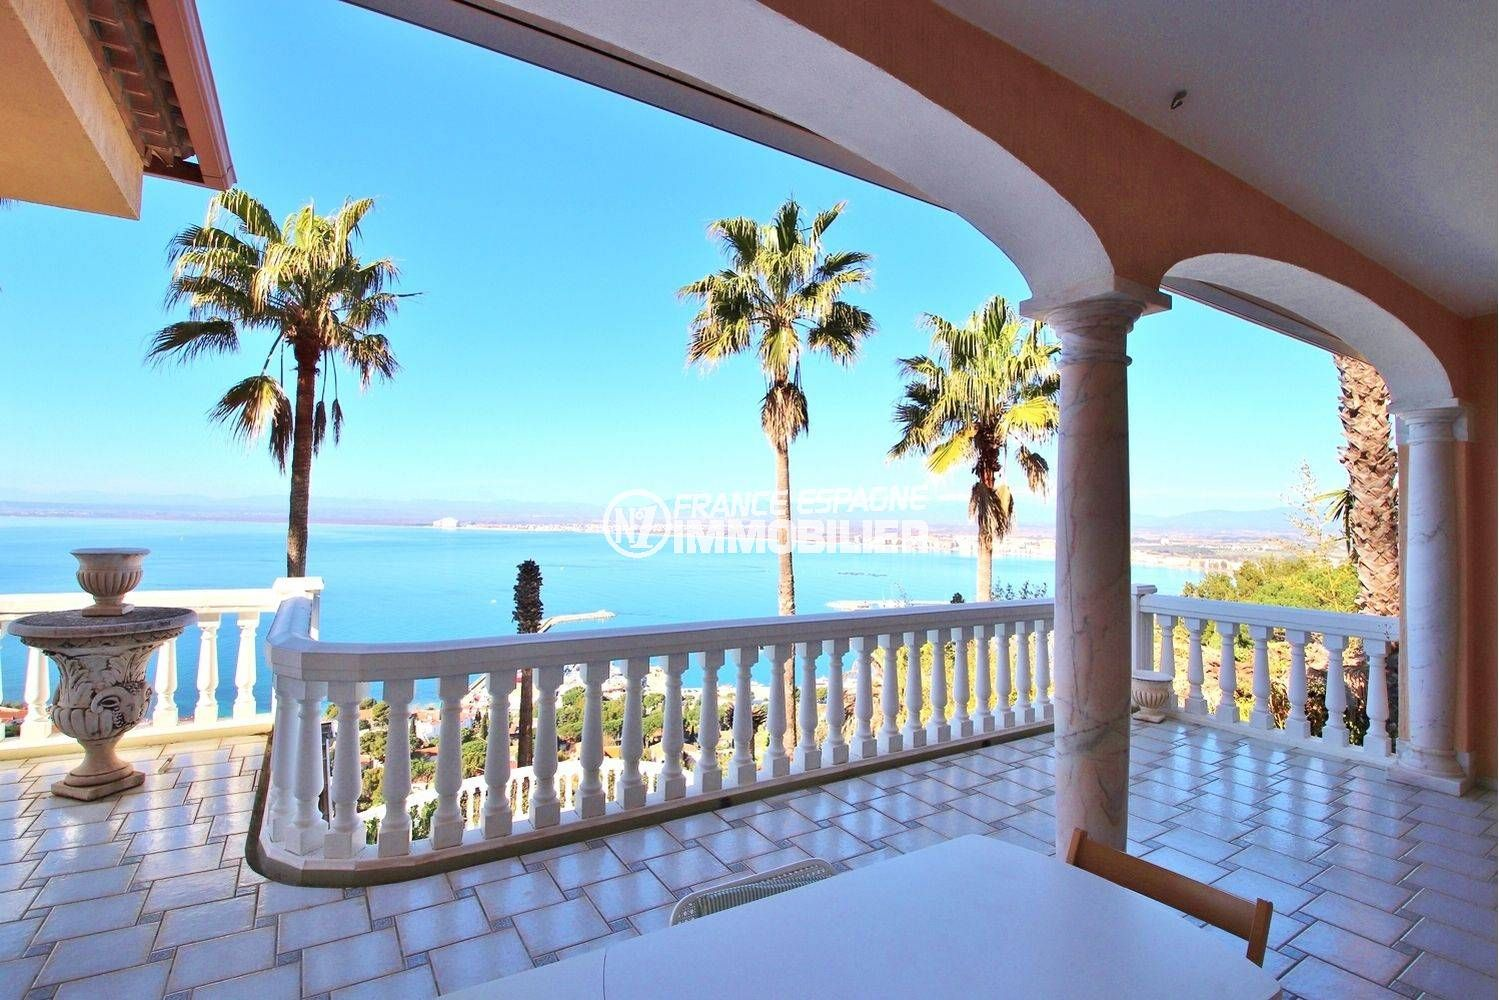 agence immobilière costa brava: villa ref.3614, magnifique vue depuis la terrasse